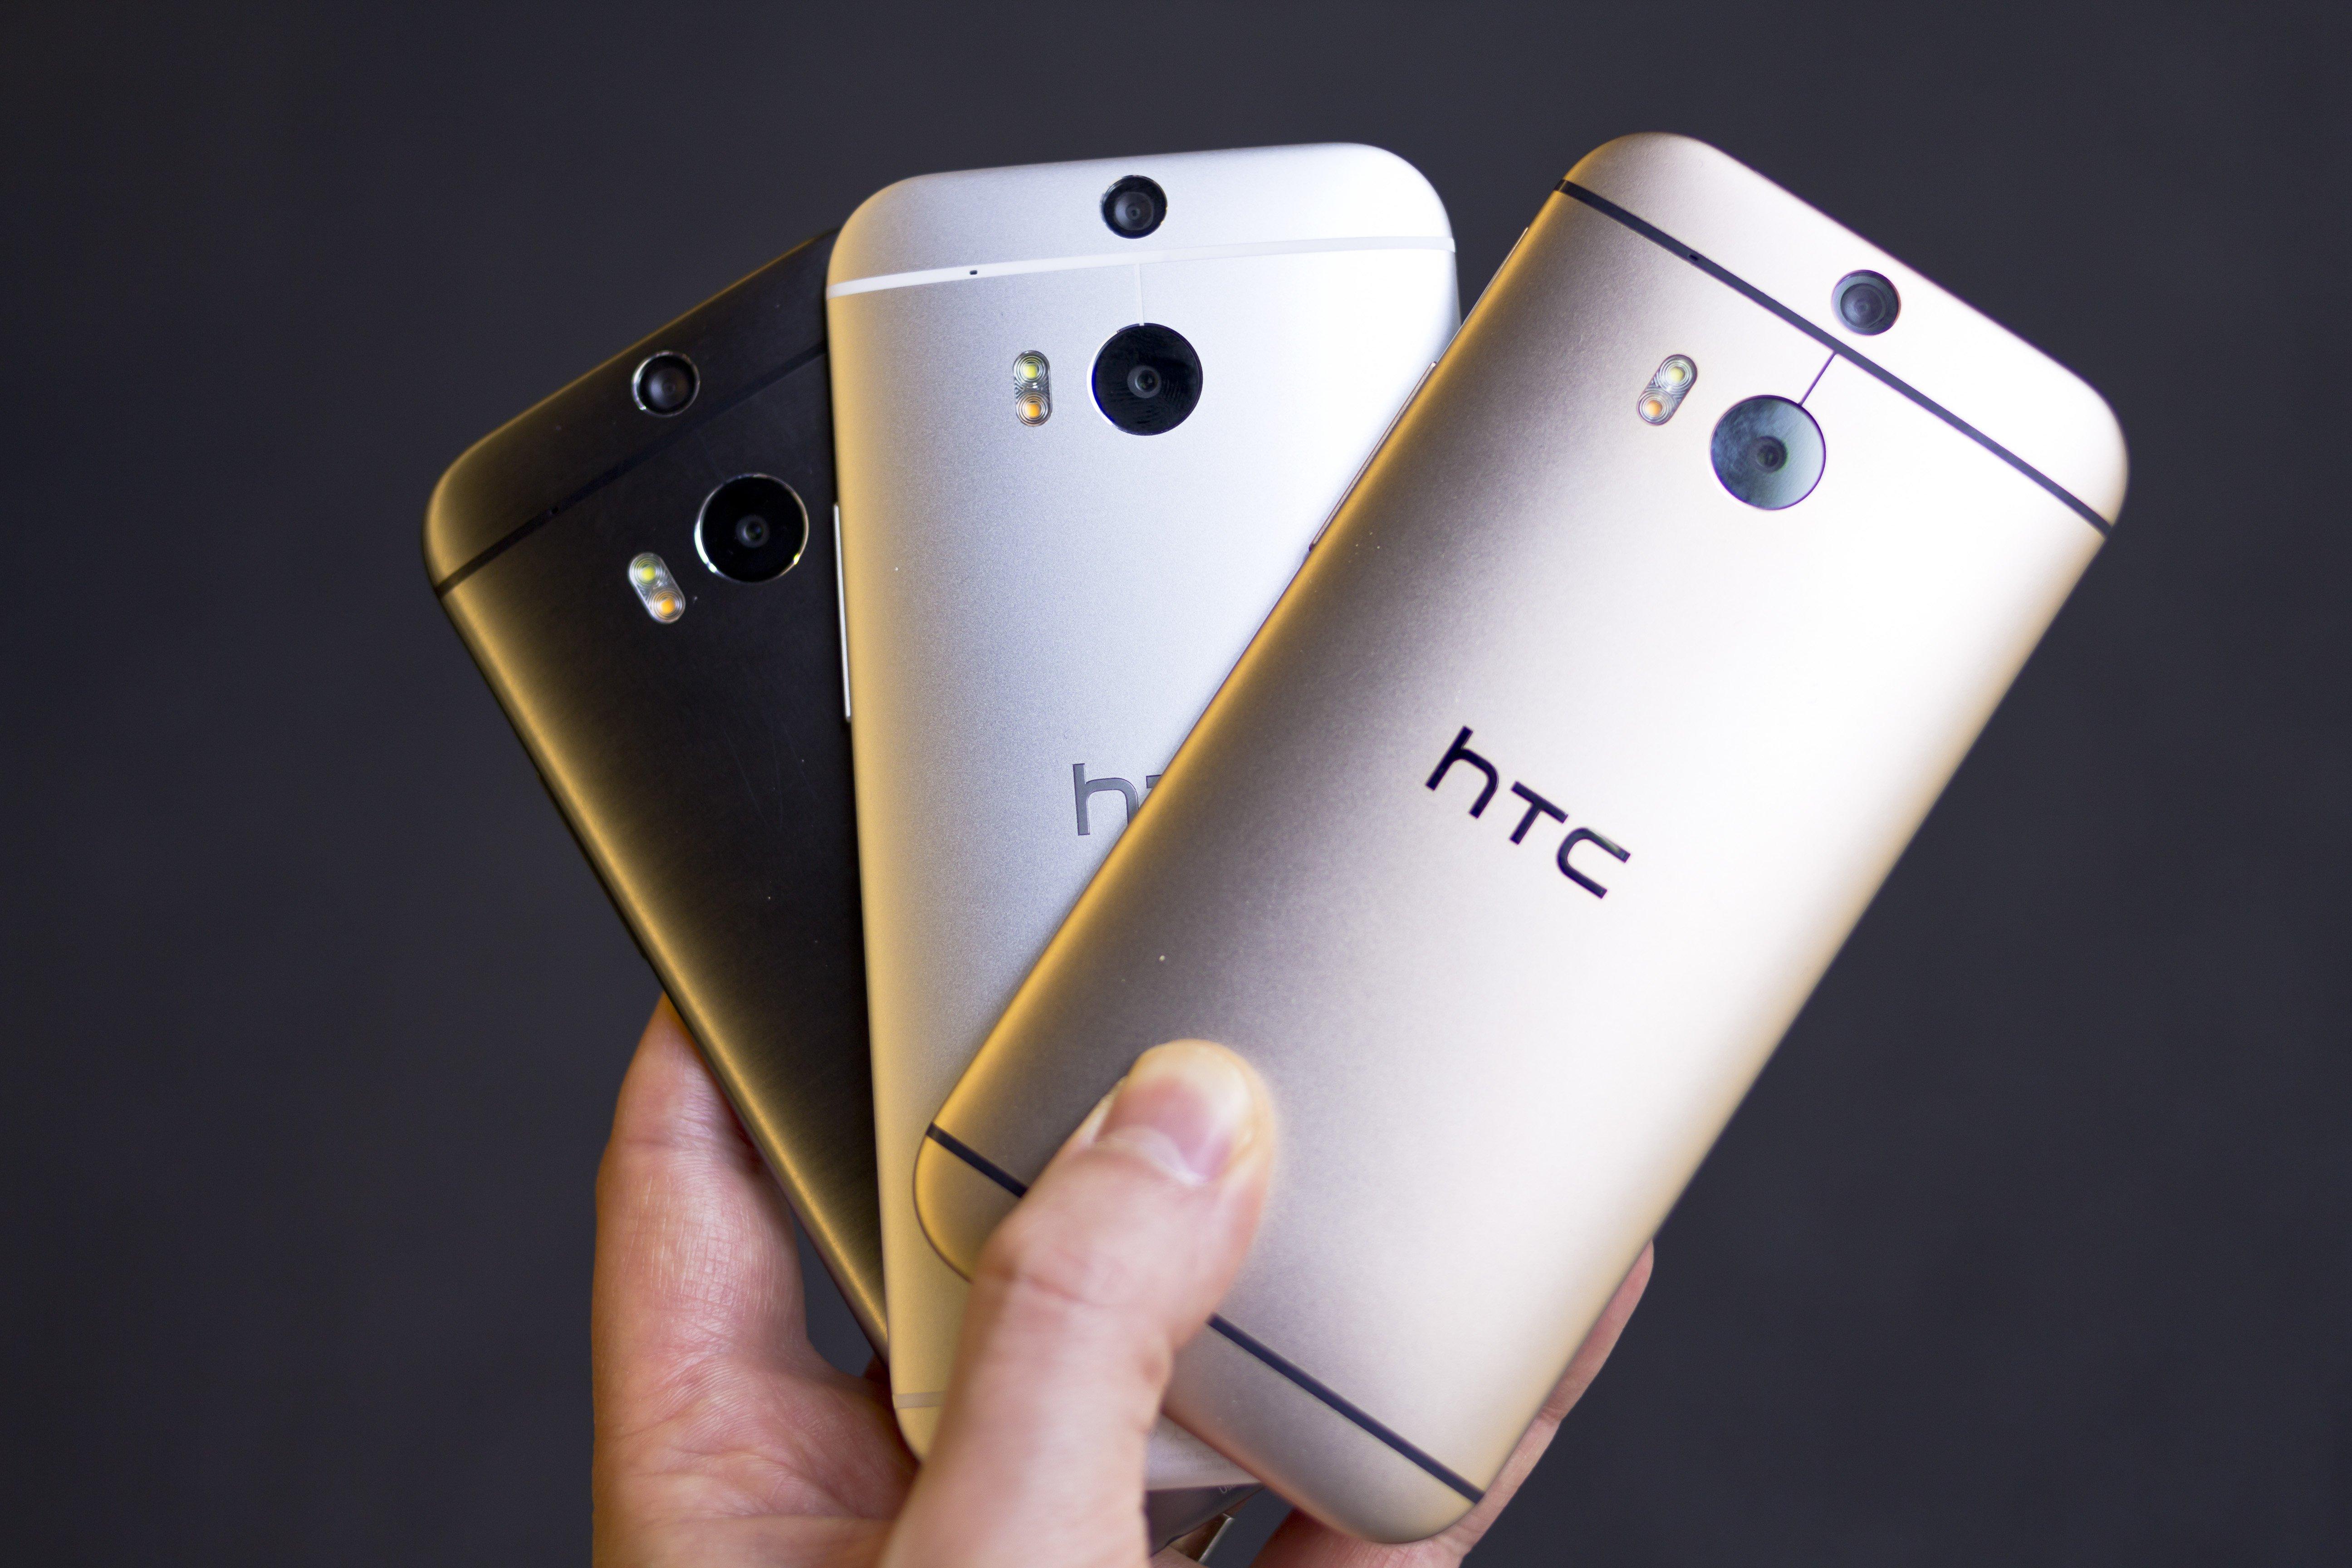 HTC One M8 Phone